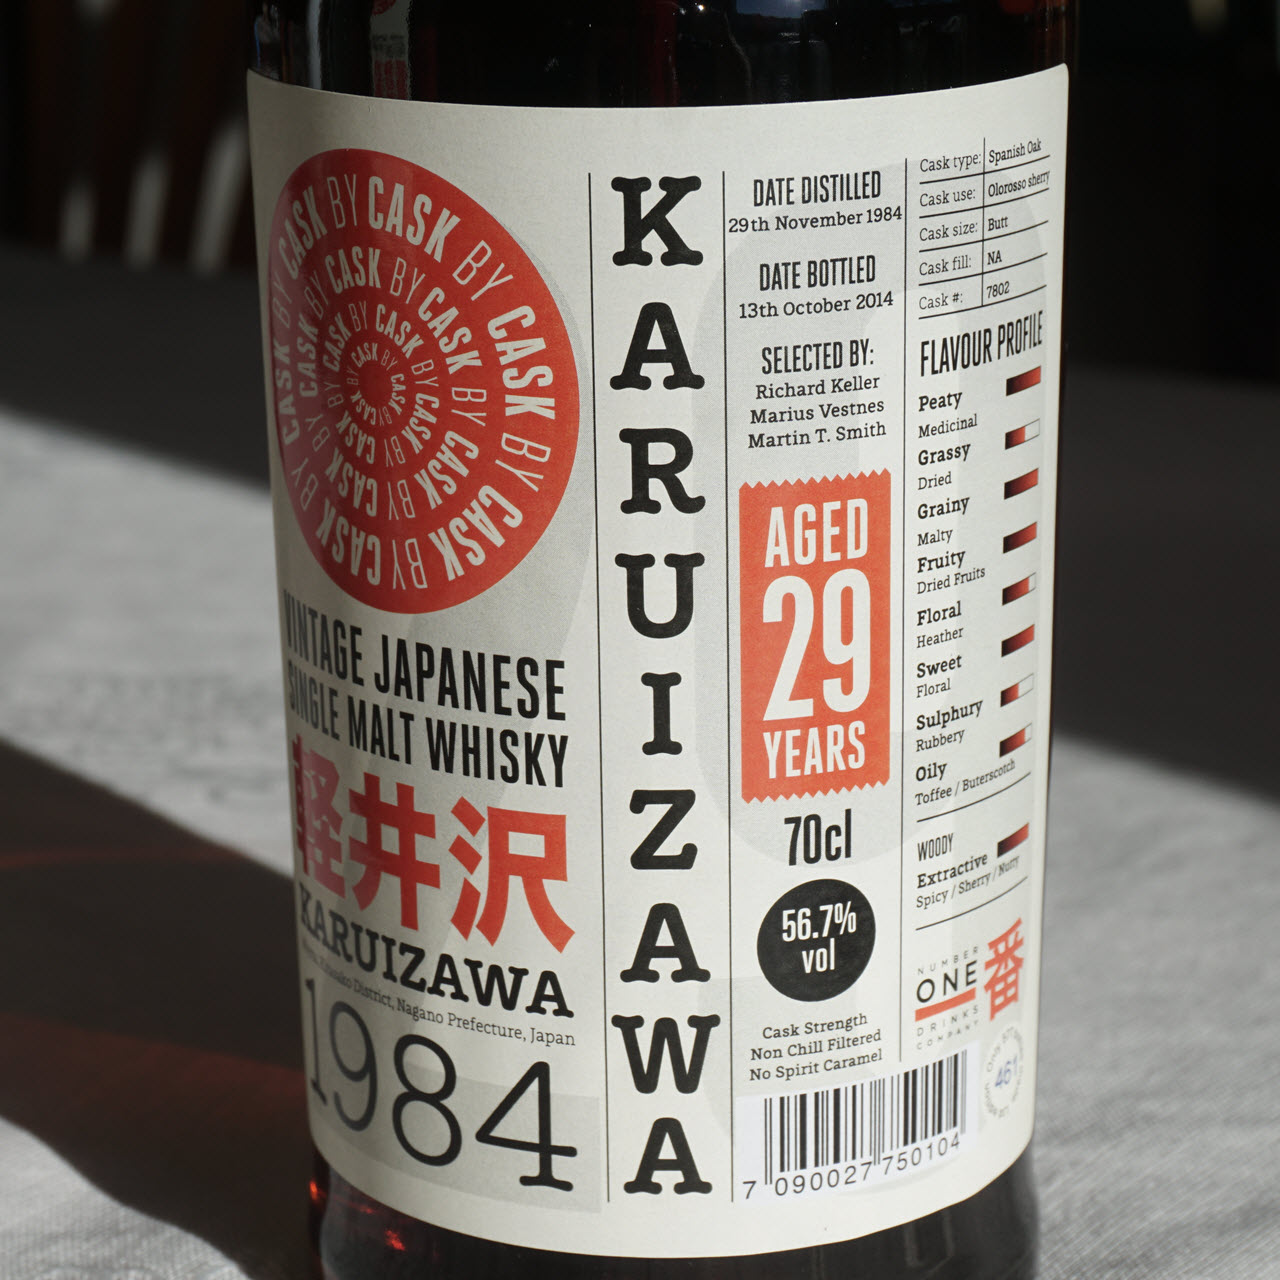 Karuizawa 1984 29 YO Cask #7802 Cask by Cask